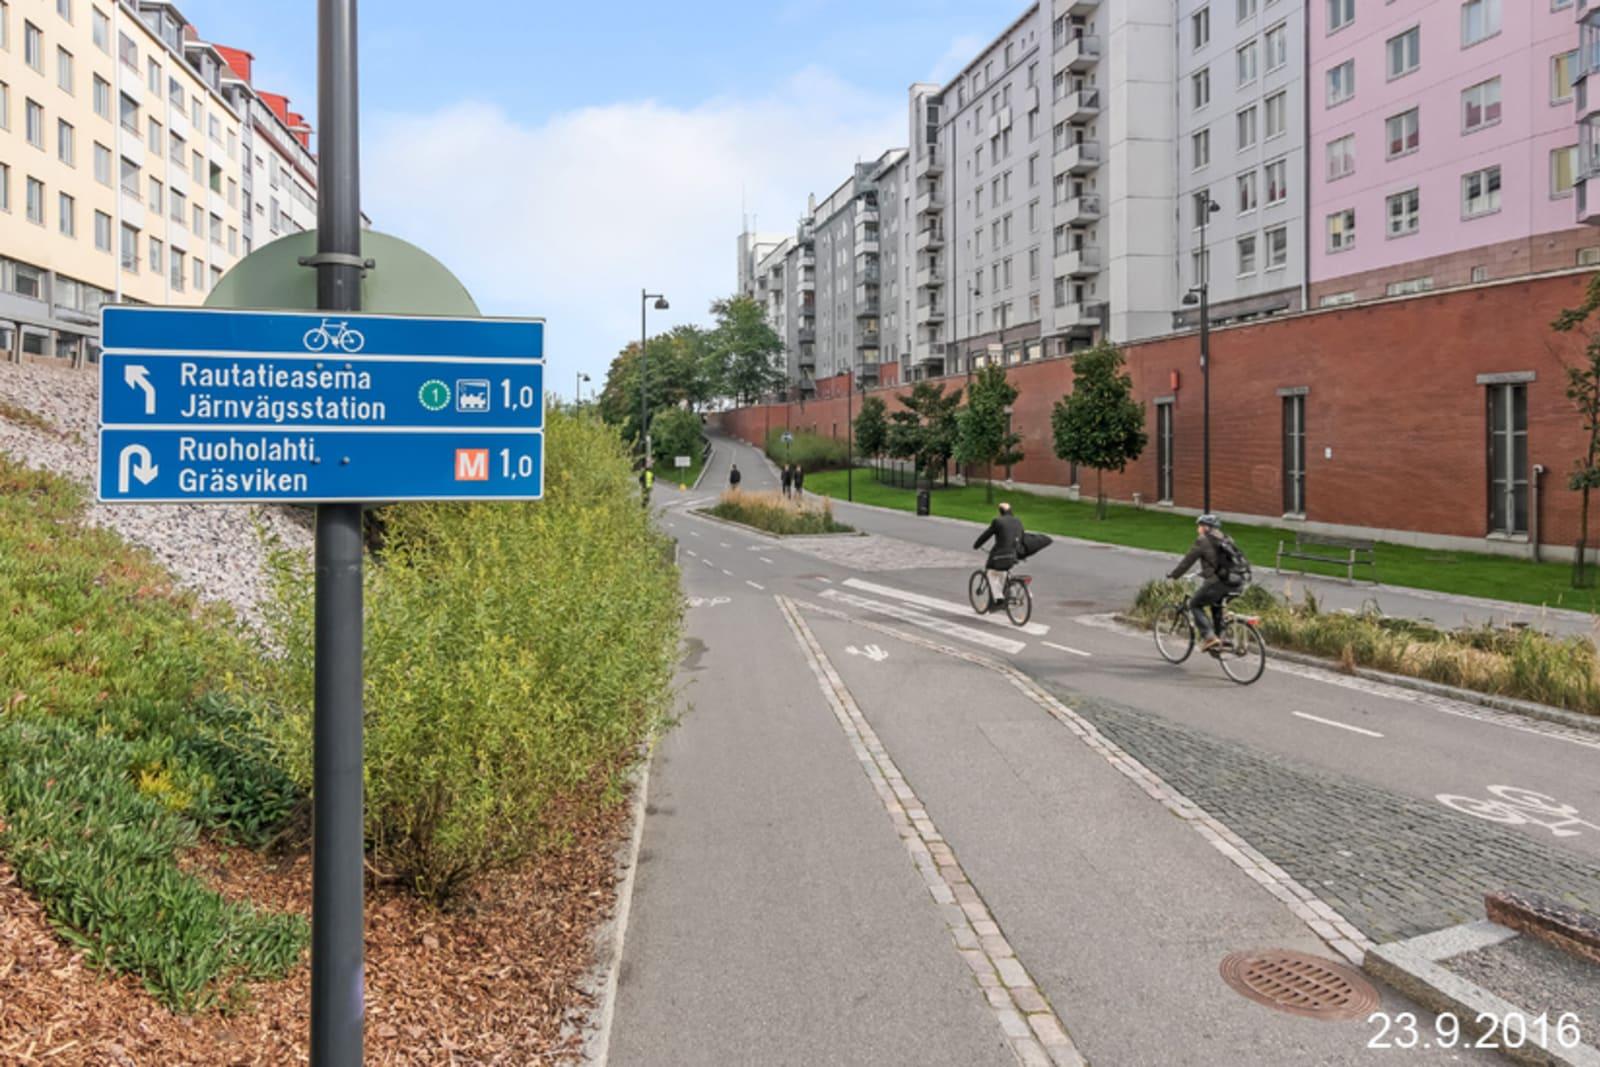 Helsinki, Etu-Töölö, Mechelininkatu 3a